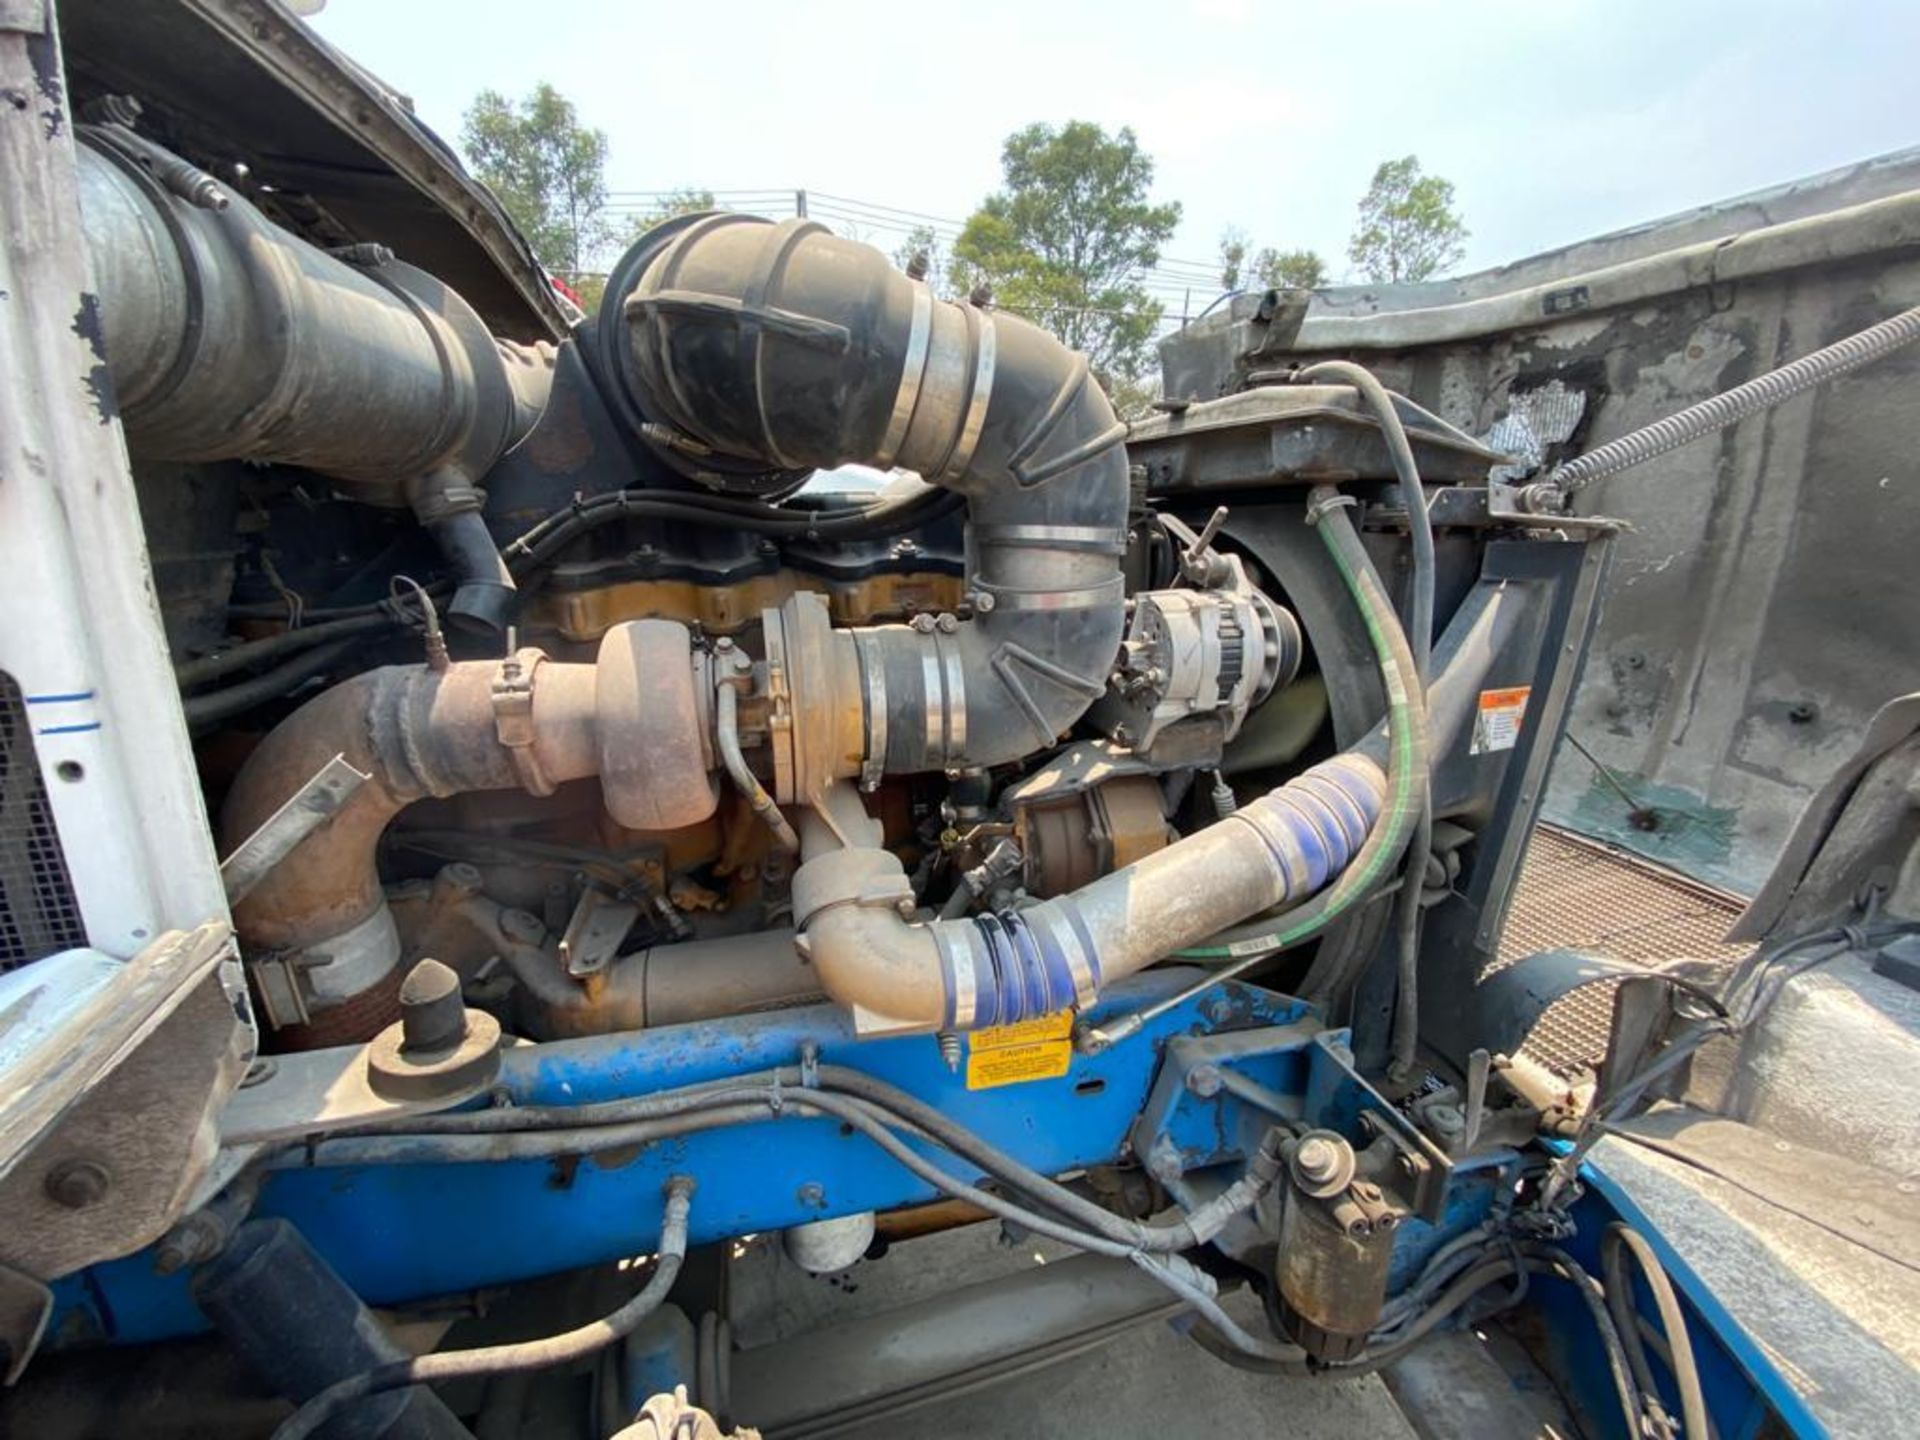 1999 Kenworth Sleeper truck tractor, standard transmission of 18 speeds - Image 70 of 70